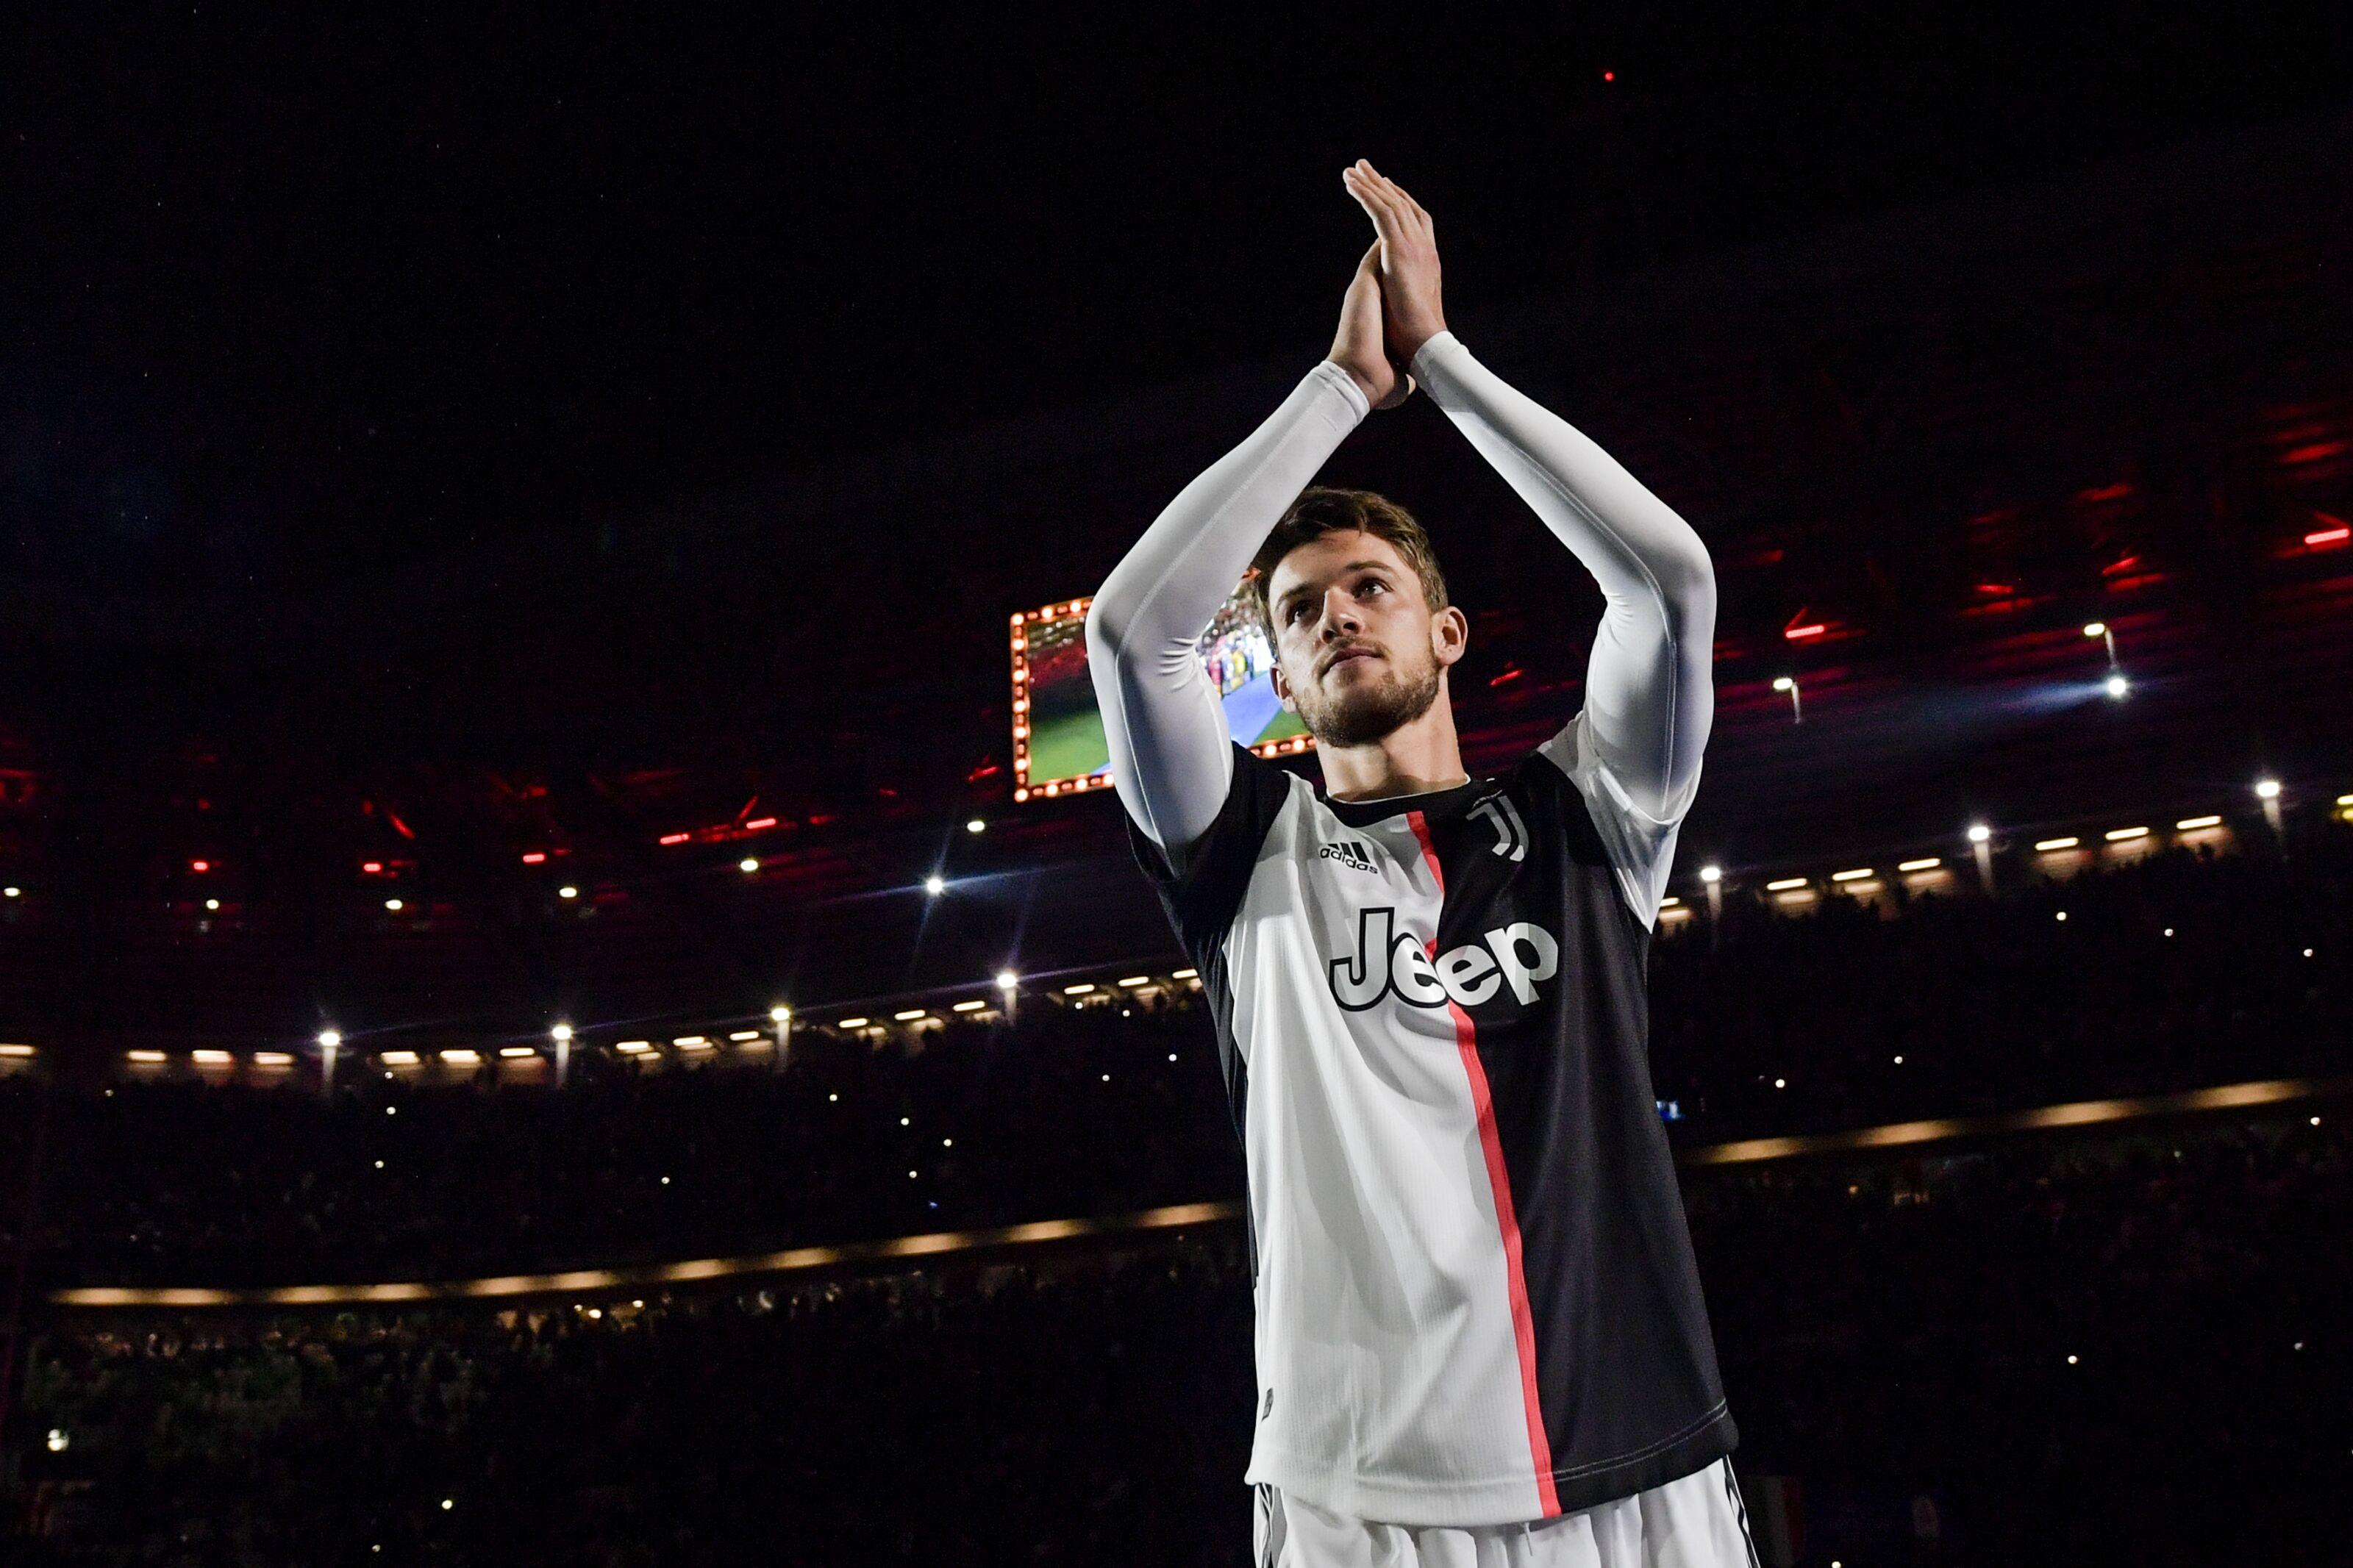 De Ligt's move could allow Barcelona to go after Juventus centre-back